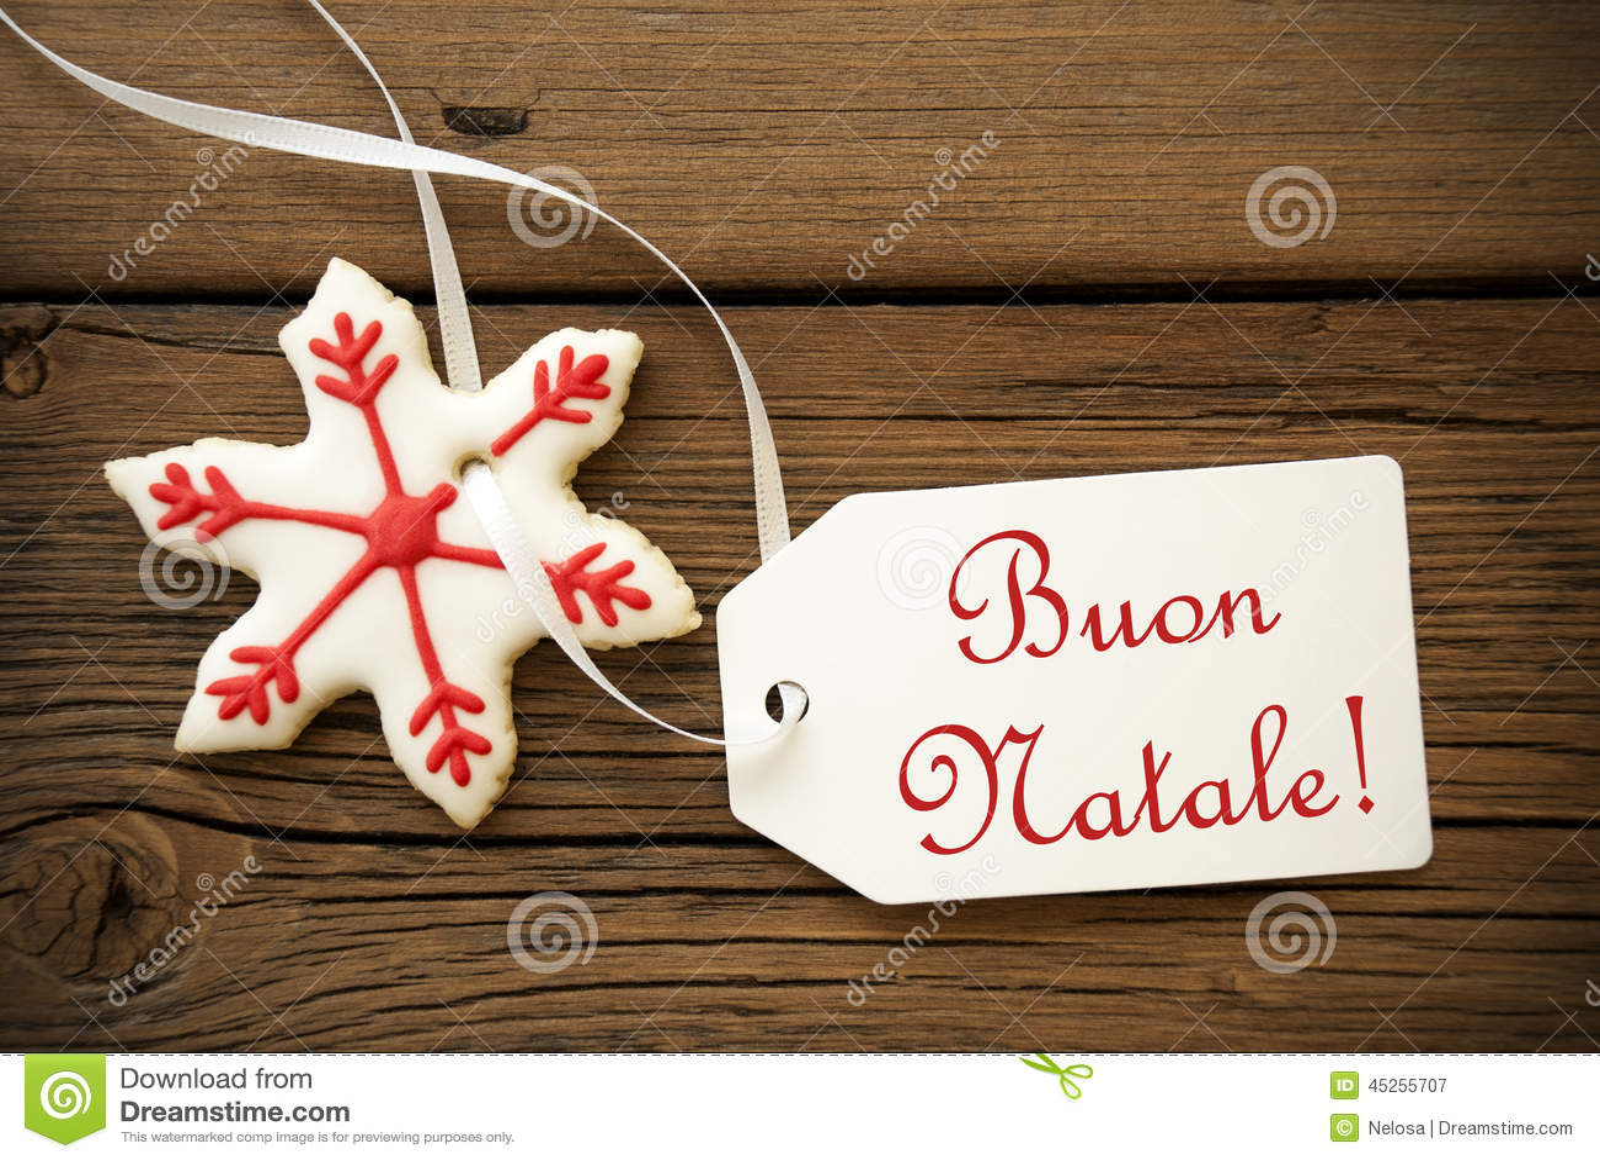 Buon Natale Italian Christmas Greetings Stock Image Image Of Food